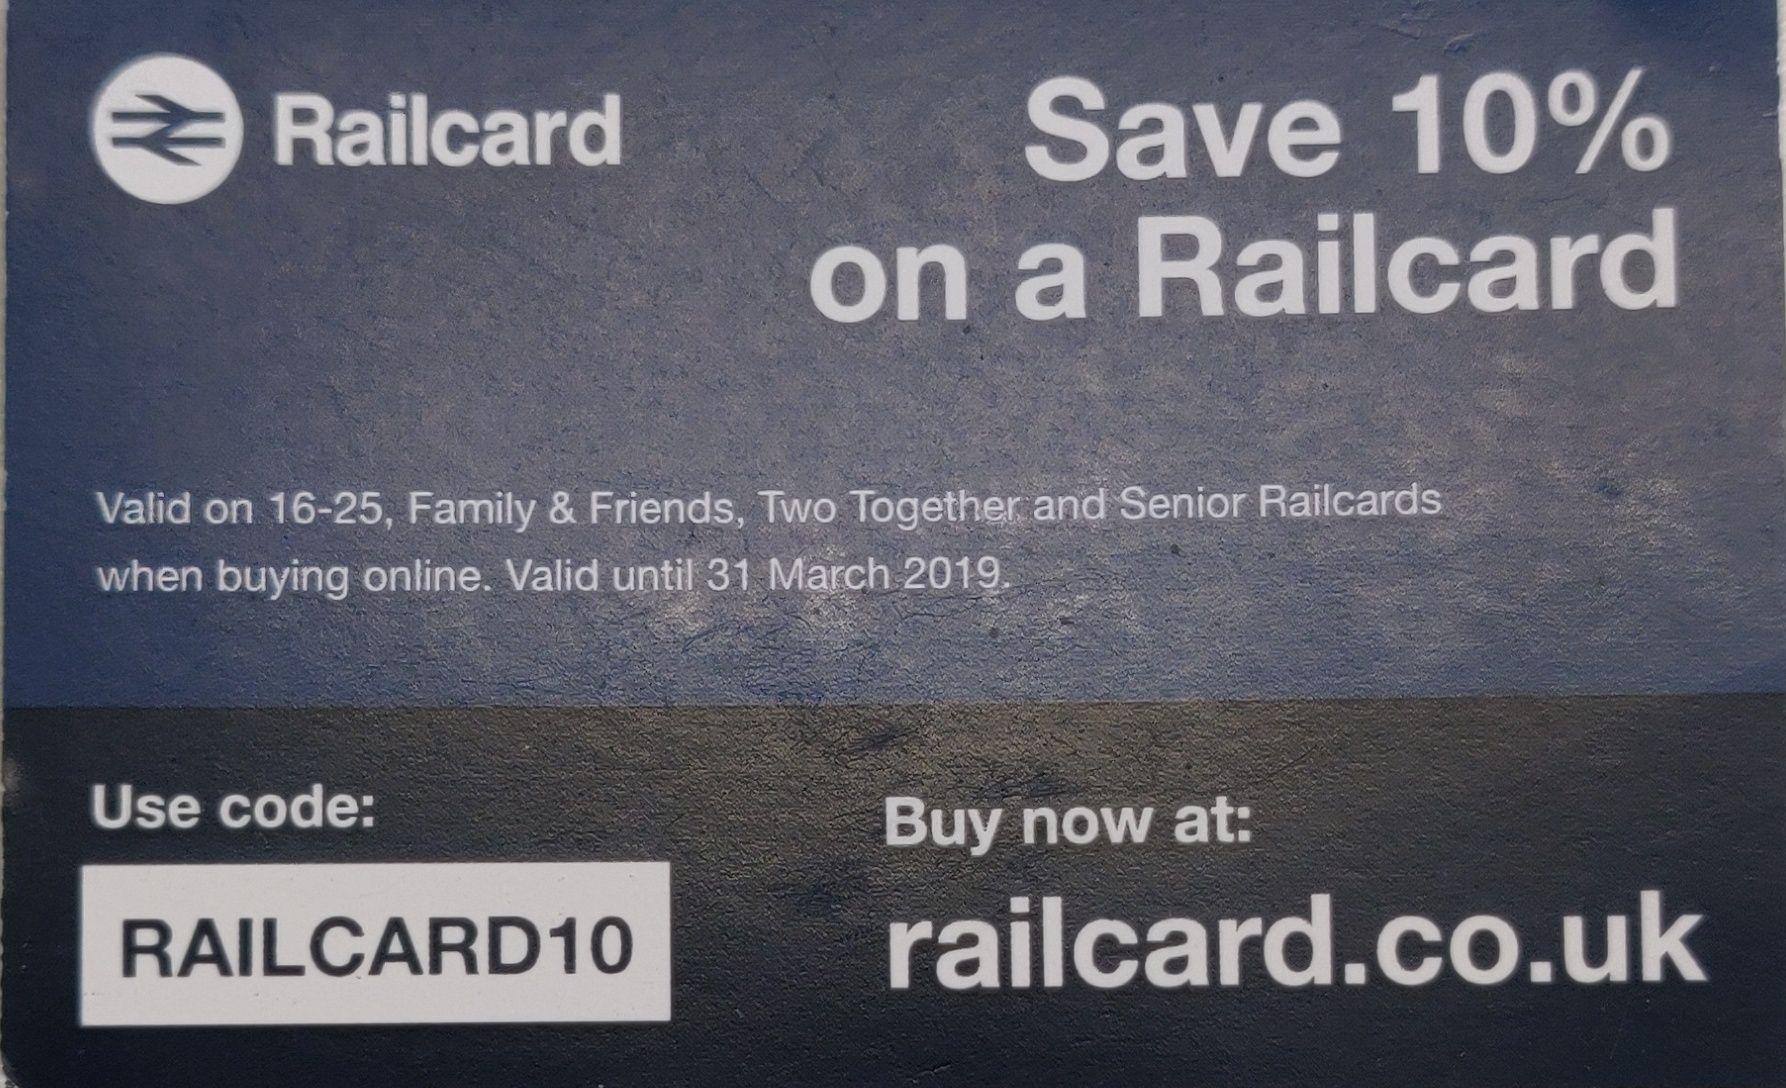 Save 10% on a Railcard